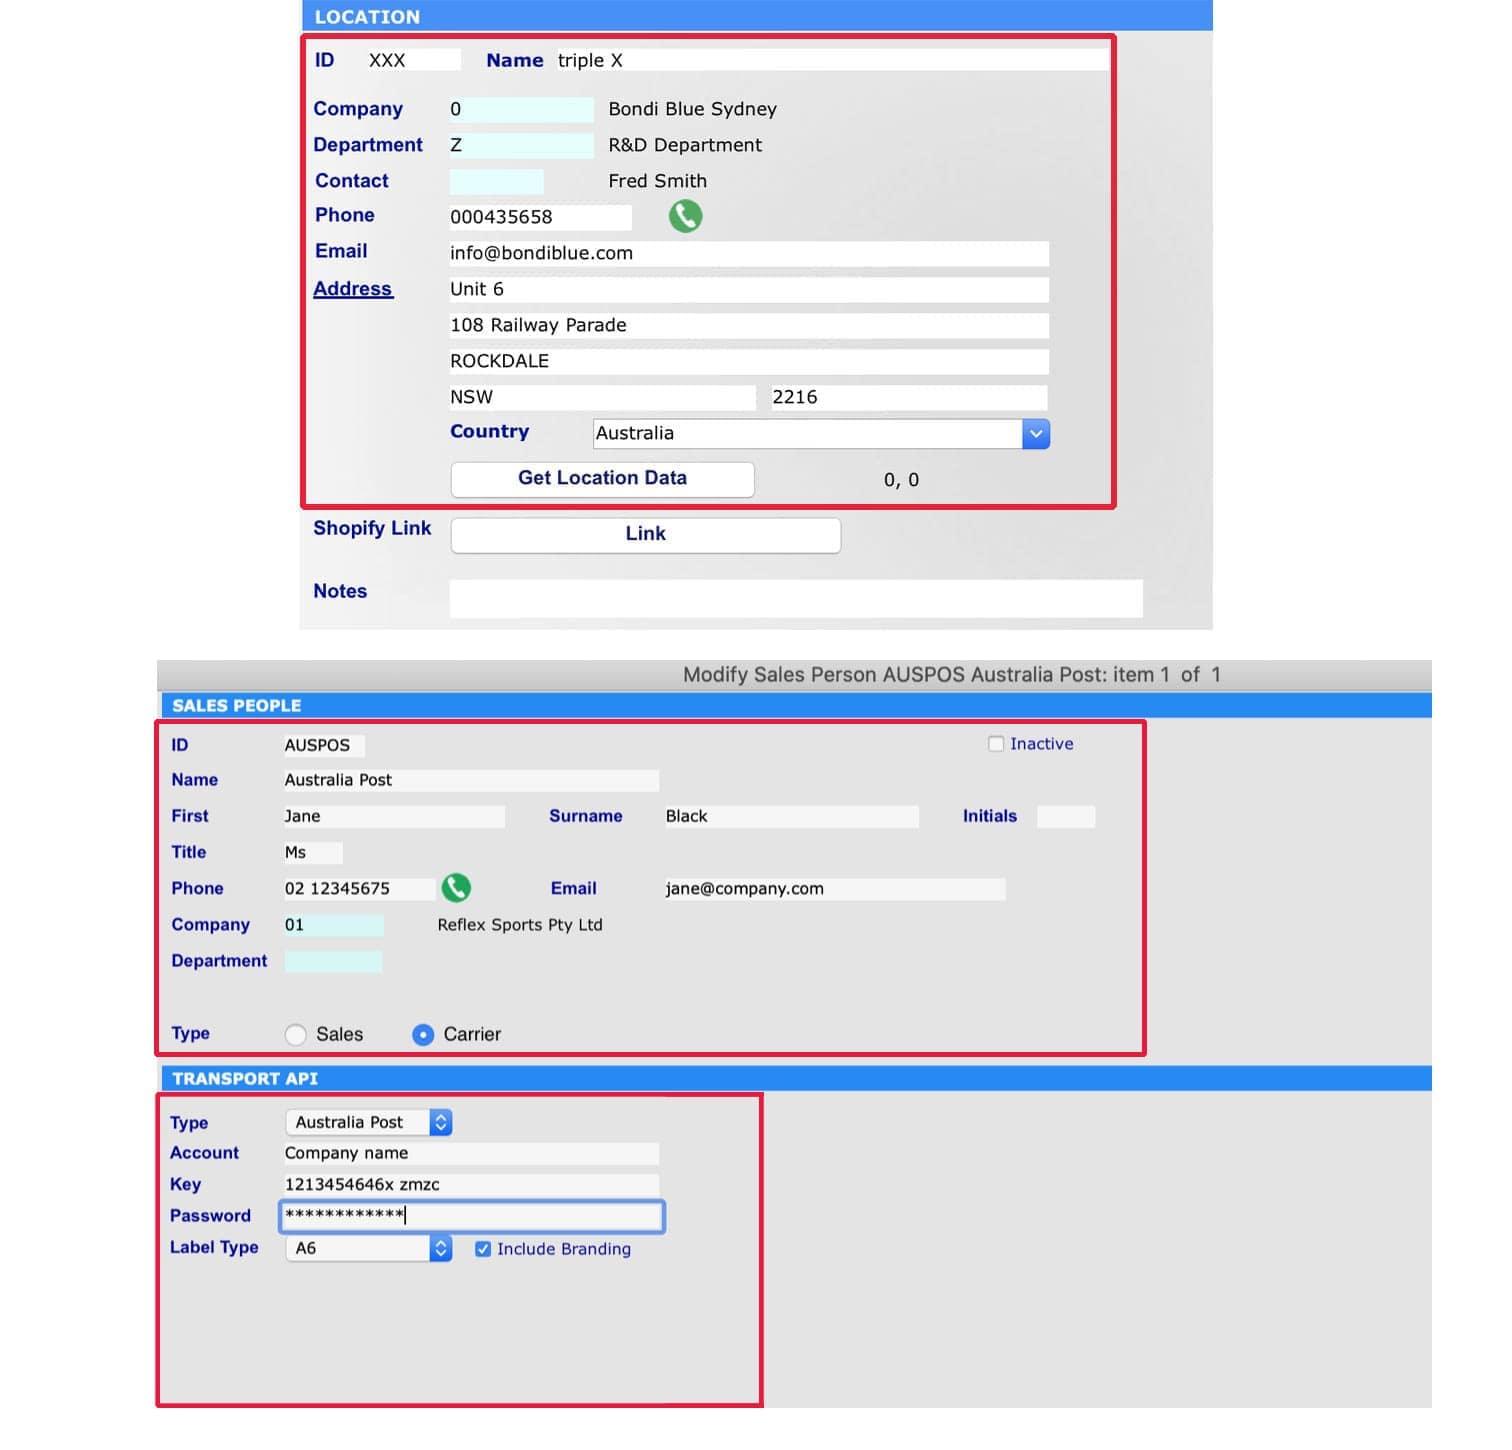 API Integration with Australia Post & Startrack